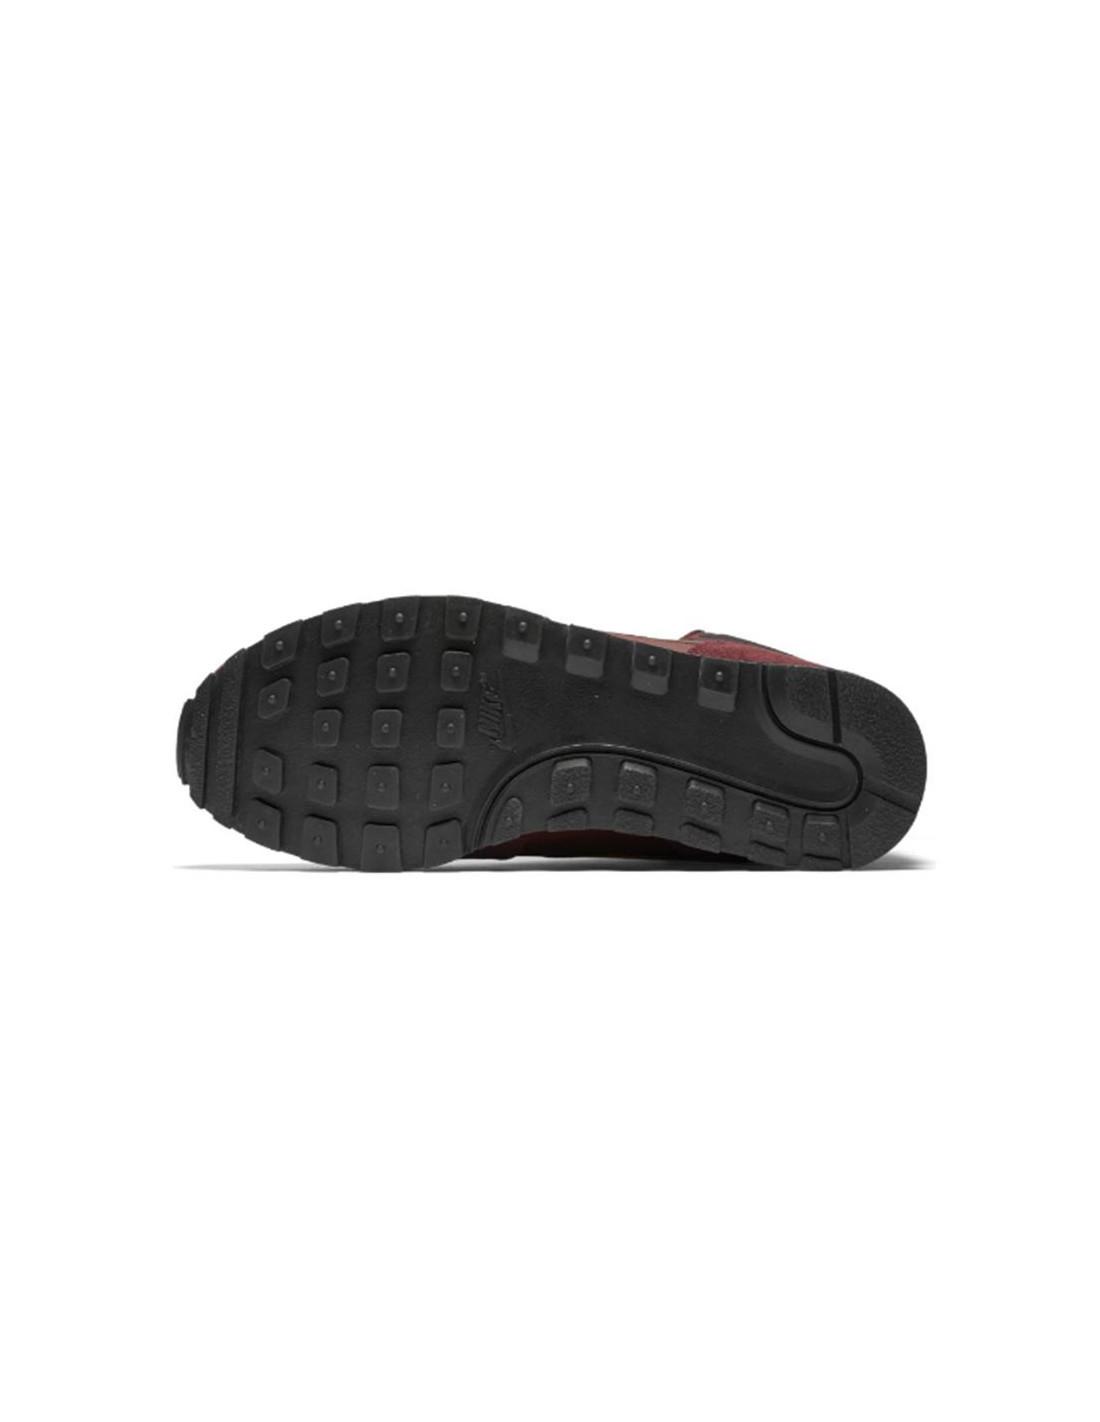 73c88ad76b4 ᐈ Zapatillas Nike MD Runner 2 – Atmosfera Sport©